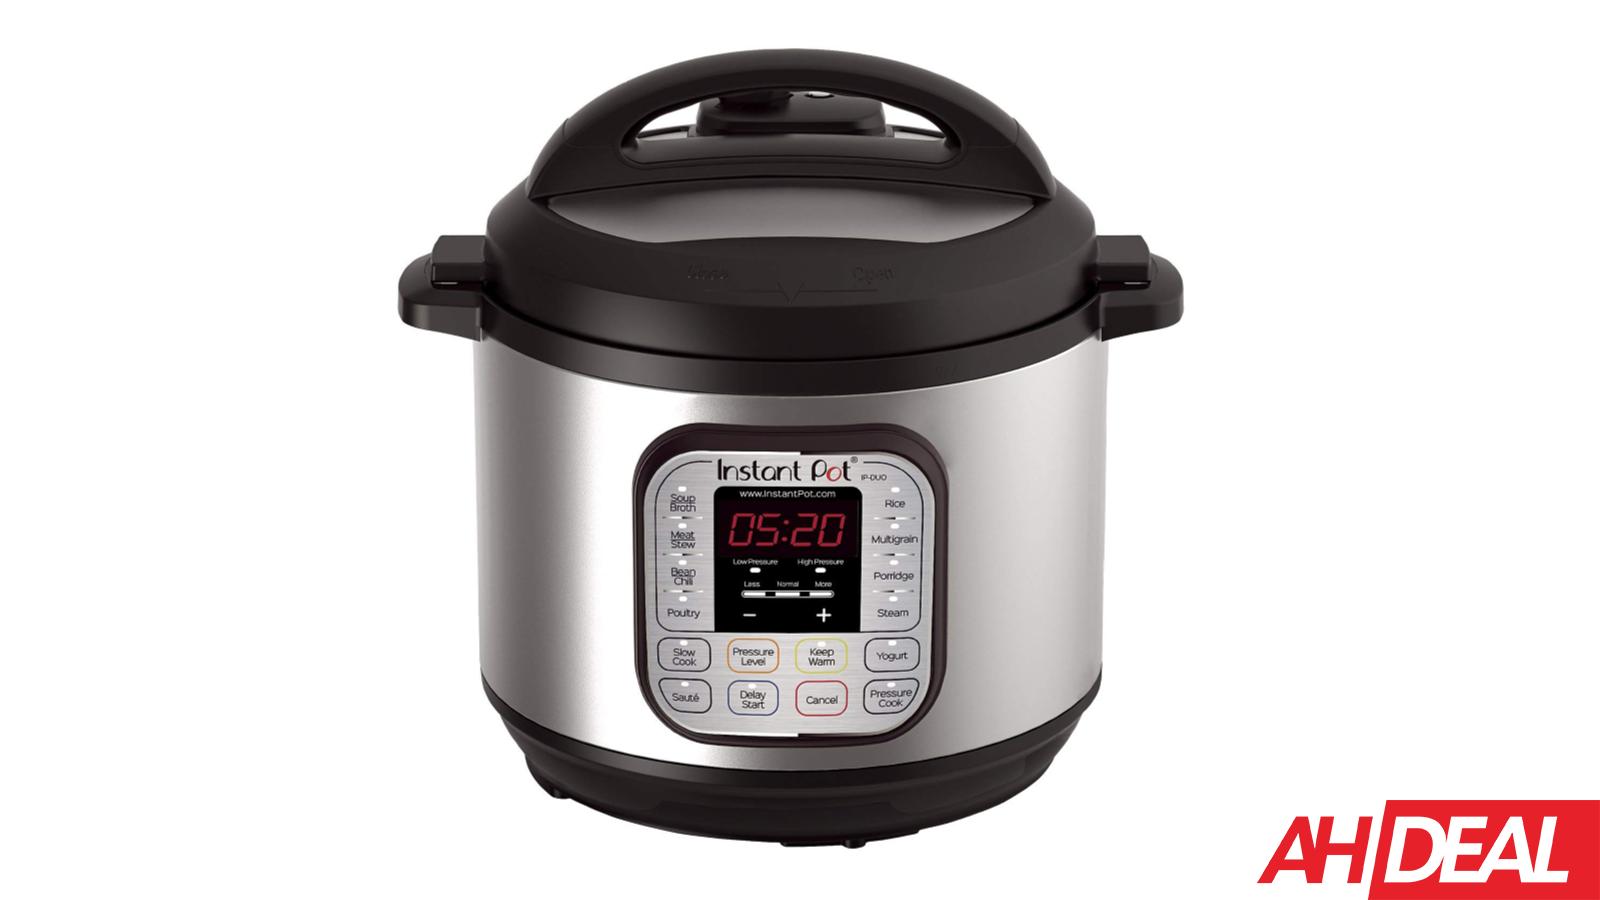 Instant Pot DUO60 6 Qt Pressure Cooker $69 – Amazon's 12 Days of Deals 2018